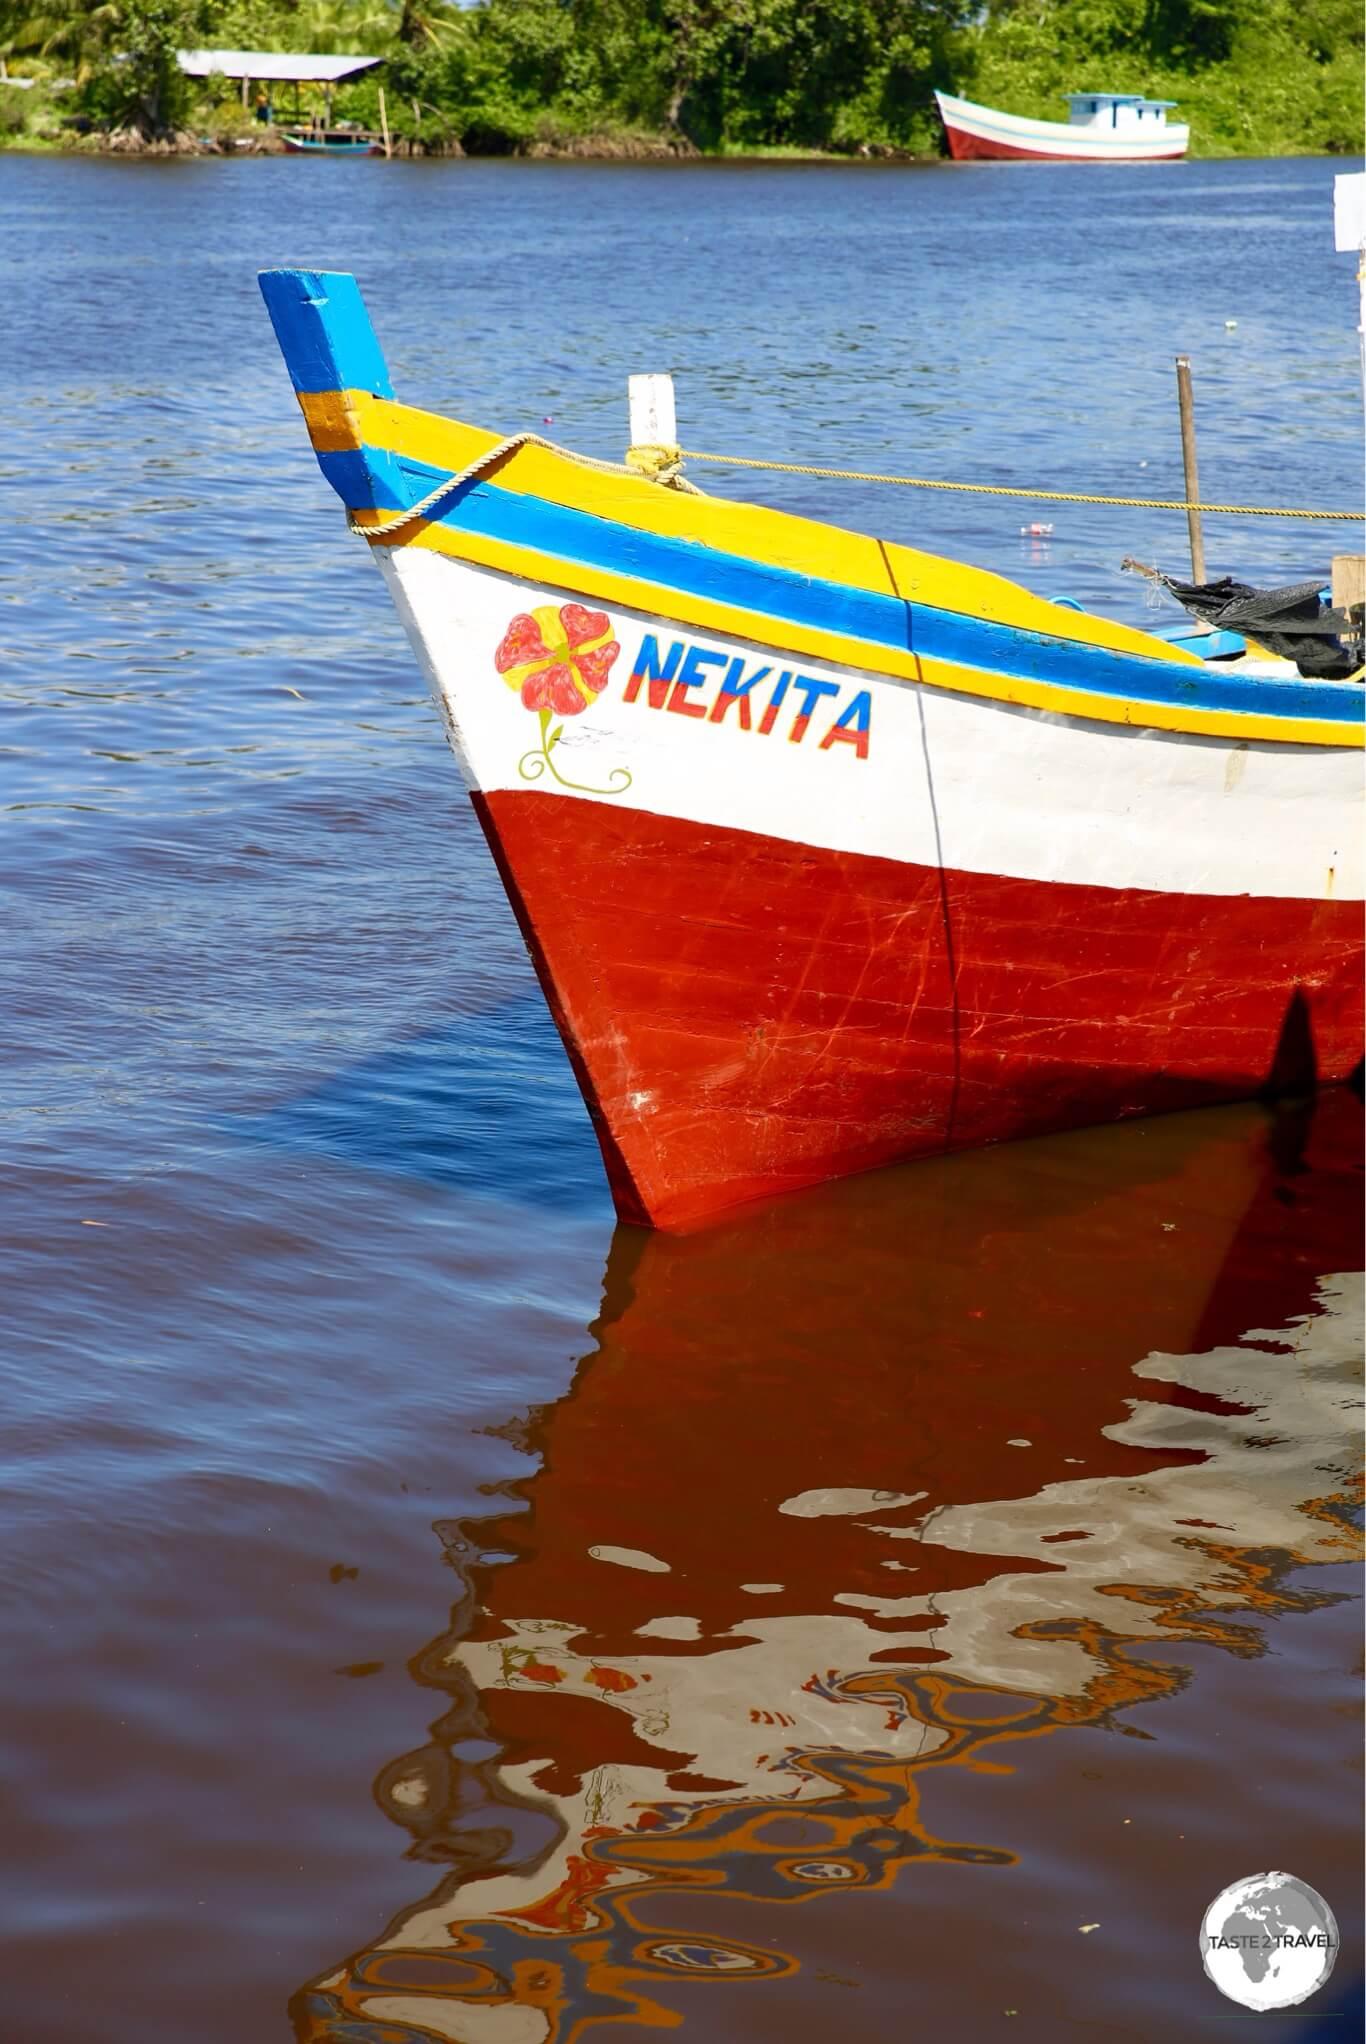 Boat docked in Charity.